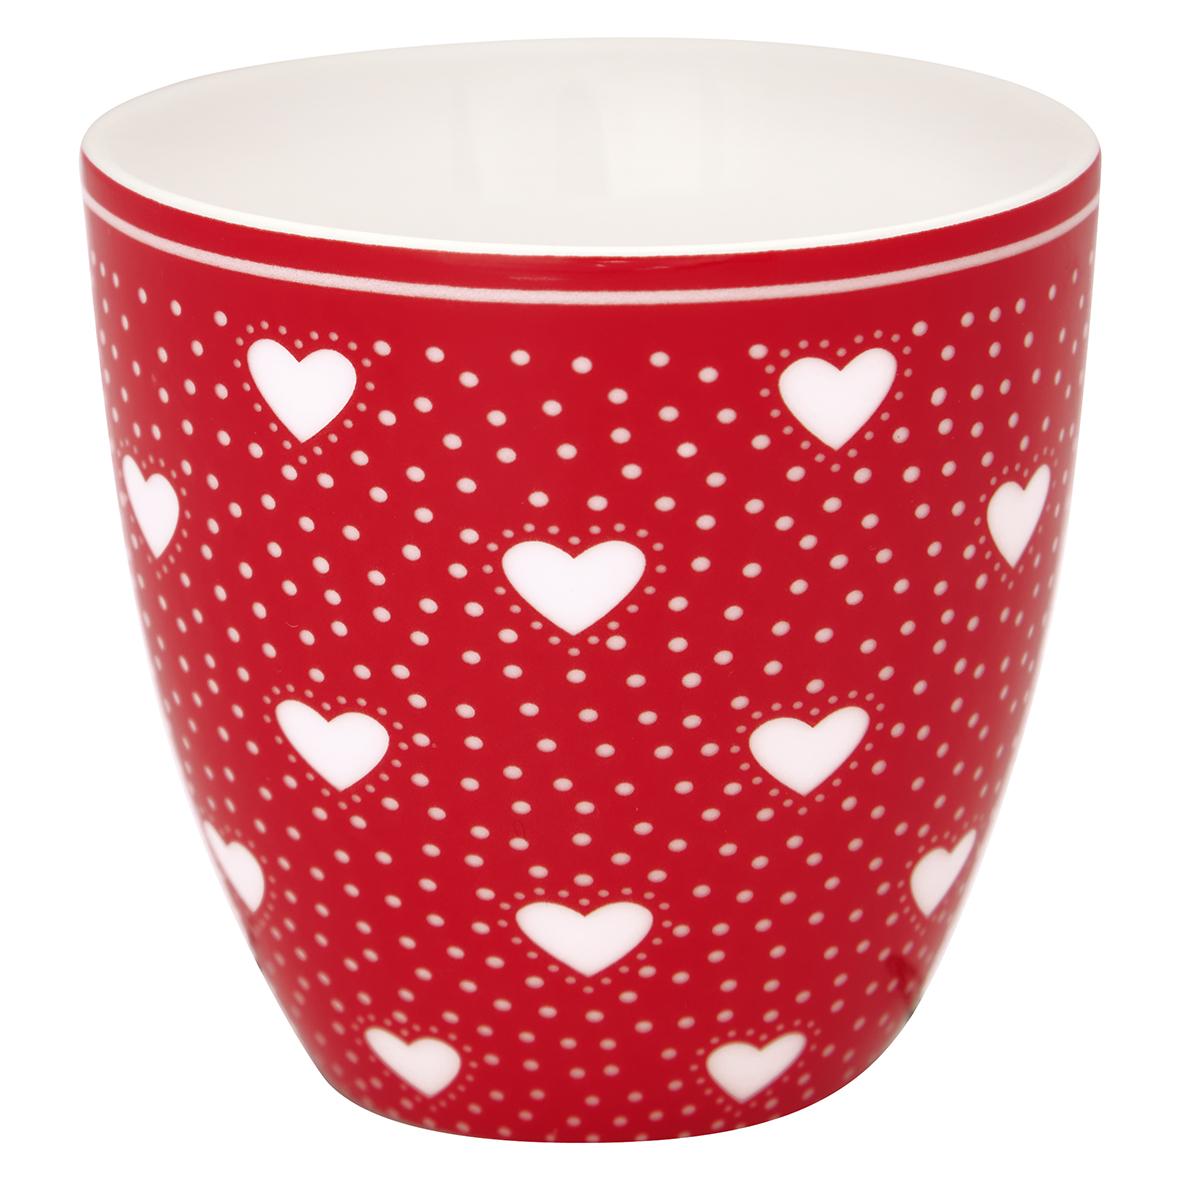 Espressotasse | Mini-Latte Cup - Penny red - Greengate